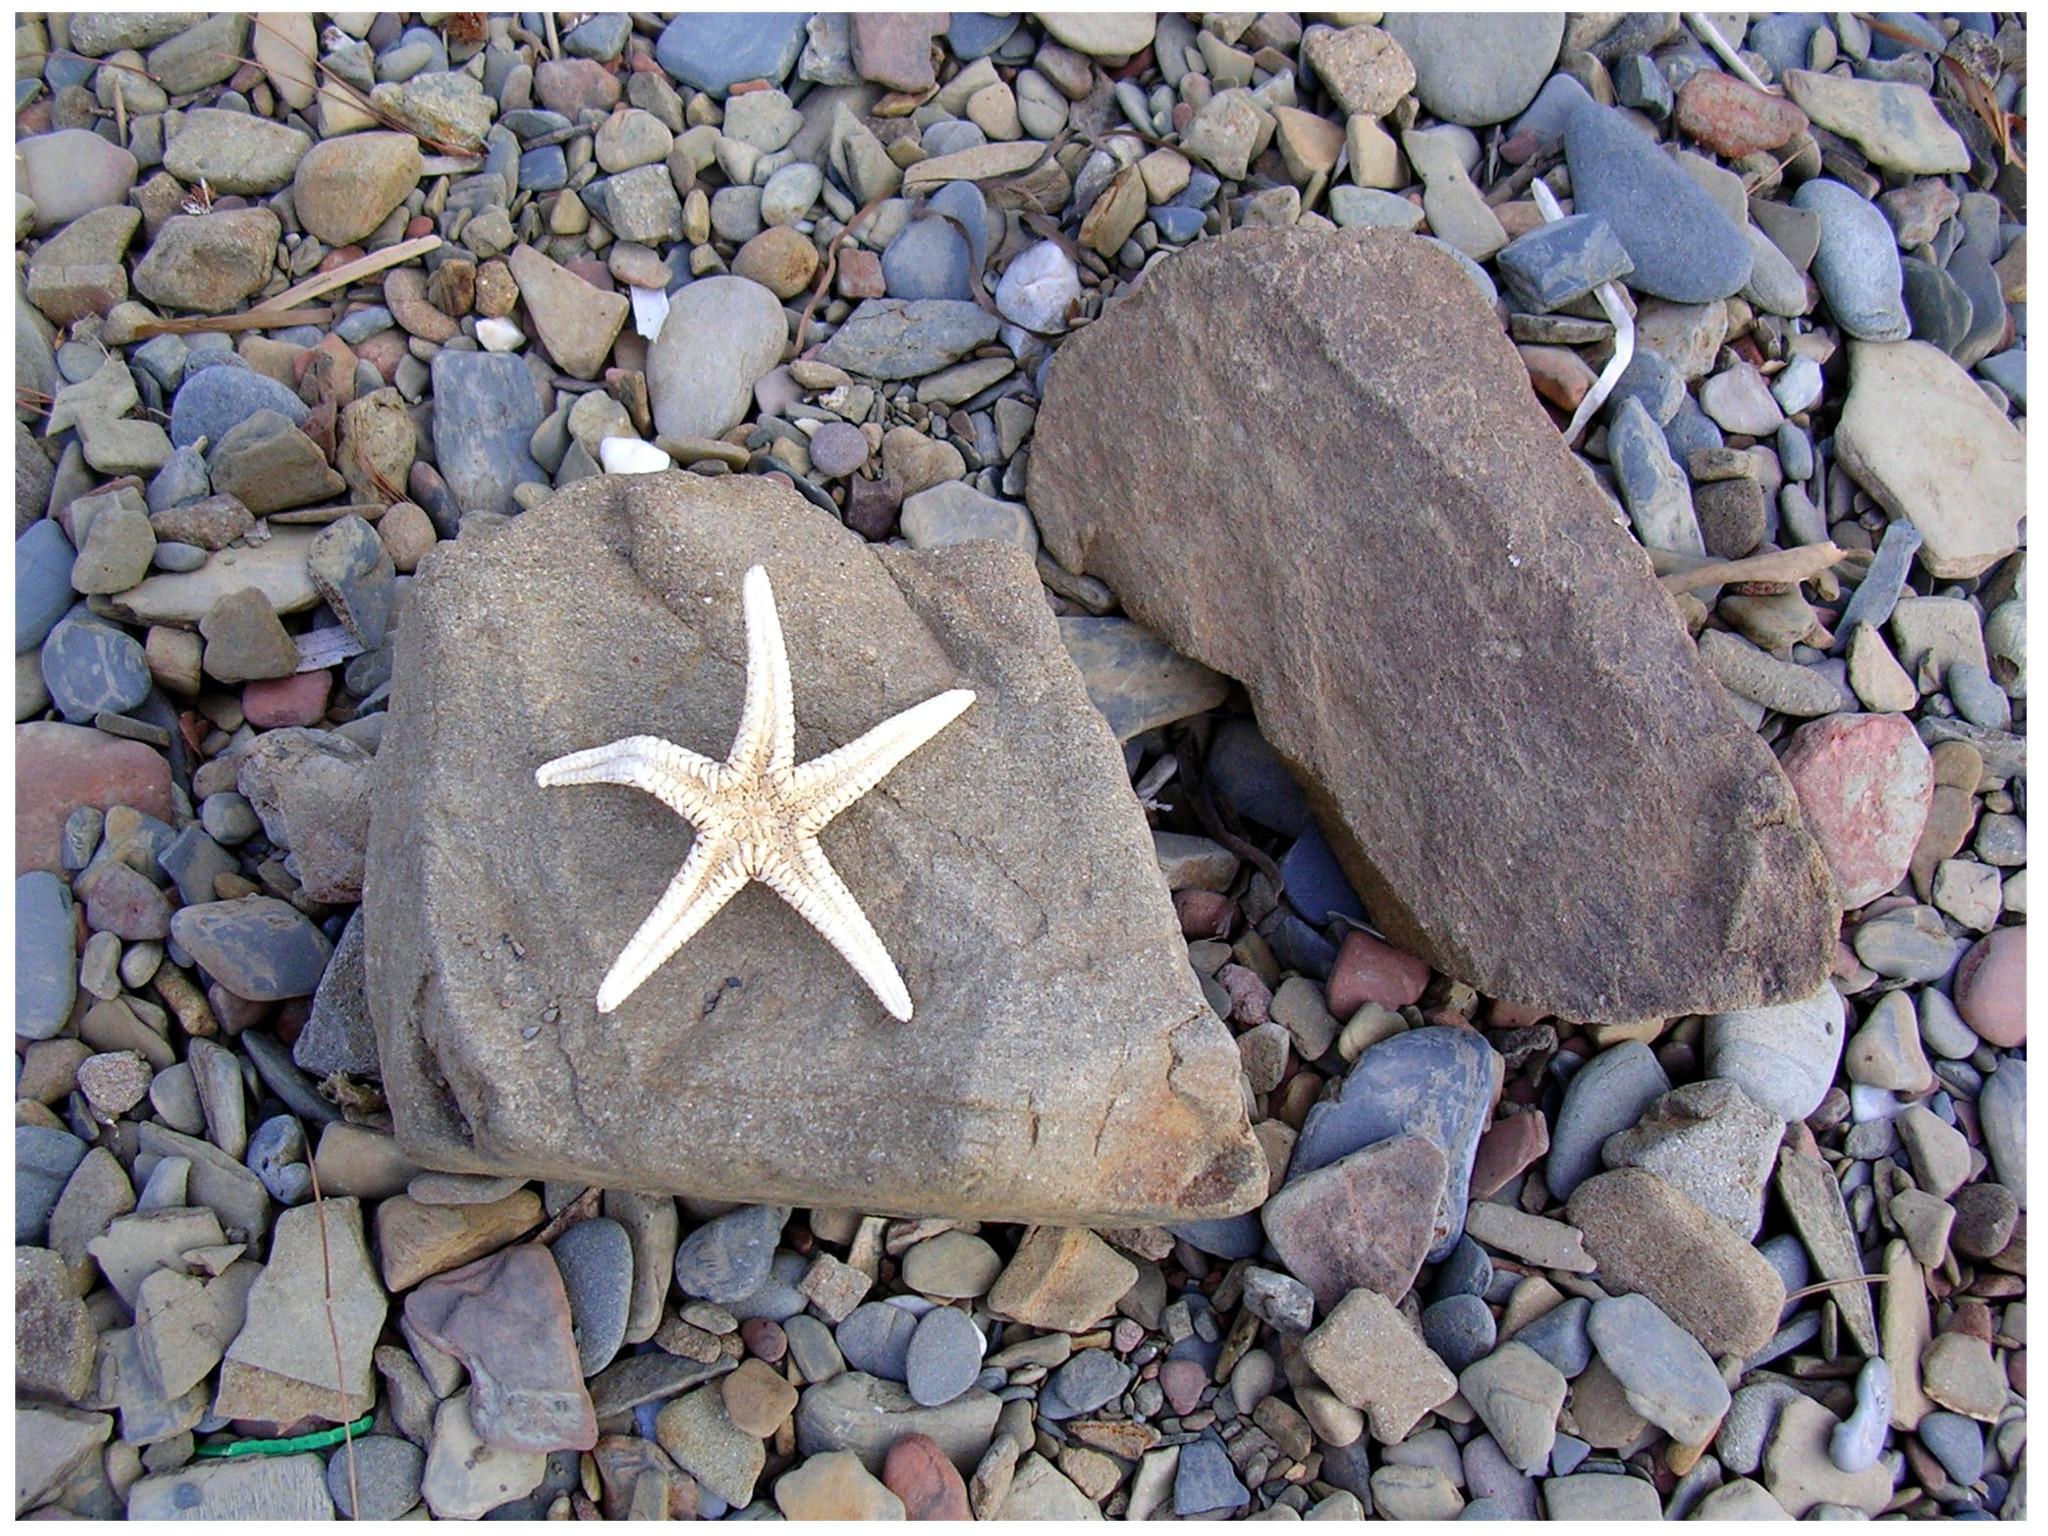 Starfish by crystalfalls